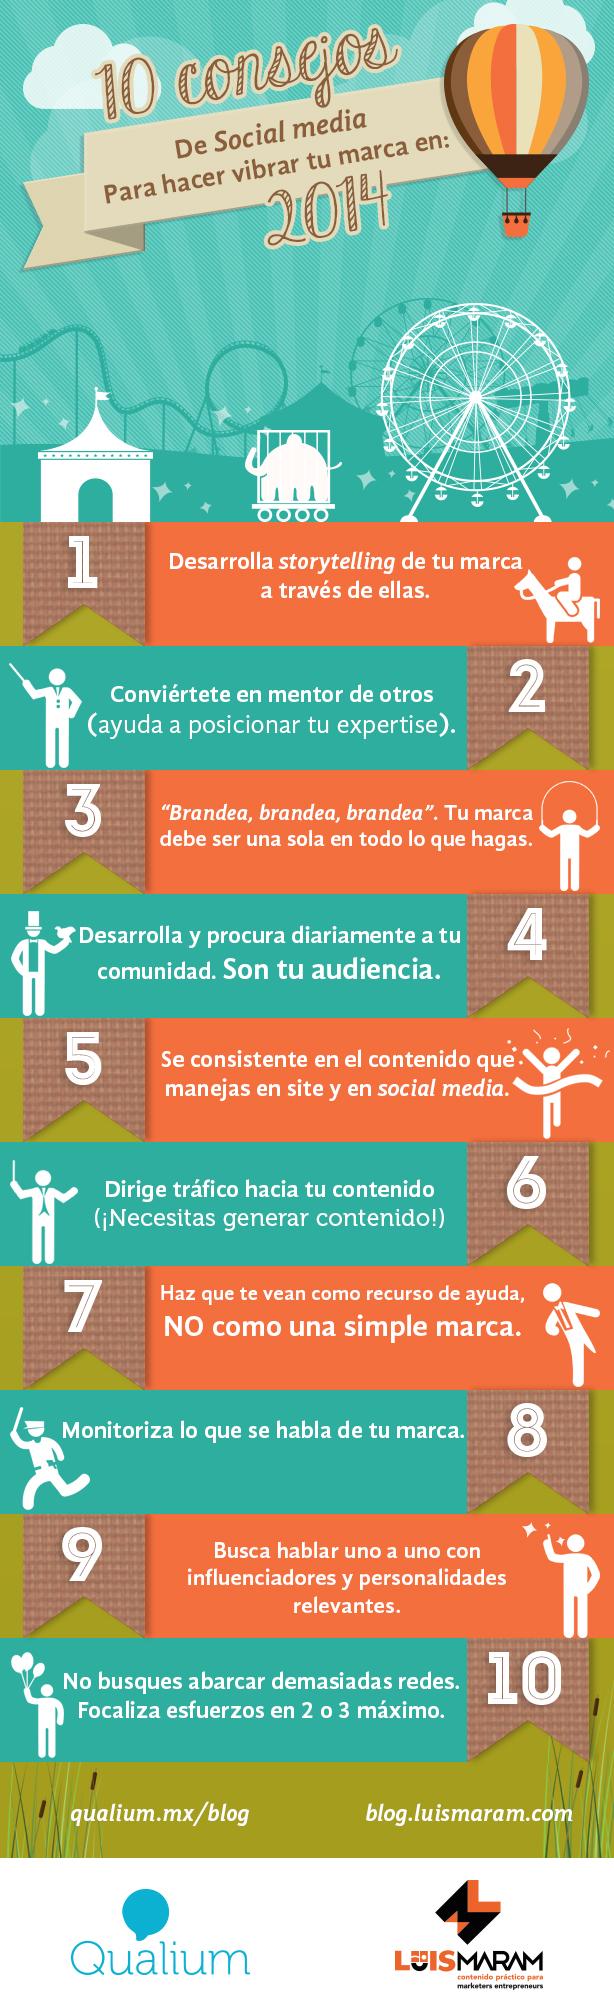 http://blog.luismaram.com/wp-content/uploads/2014/01/Mejores-Practicas-Social-Media.jpg